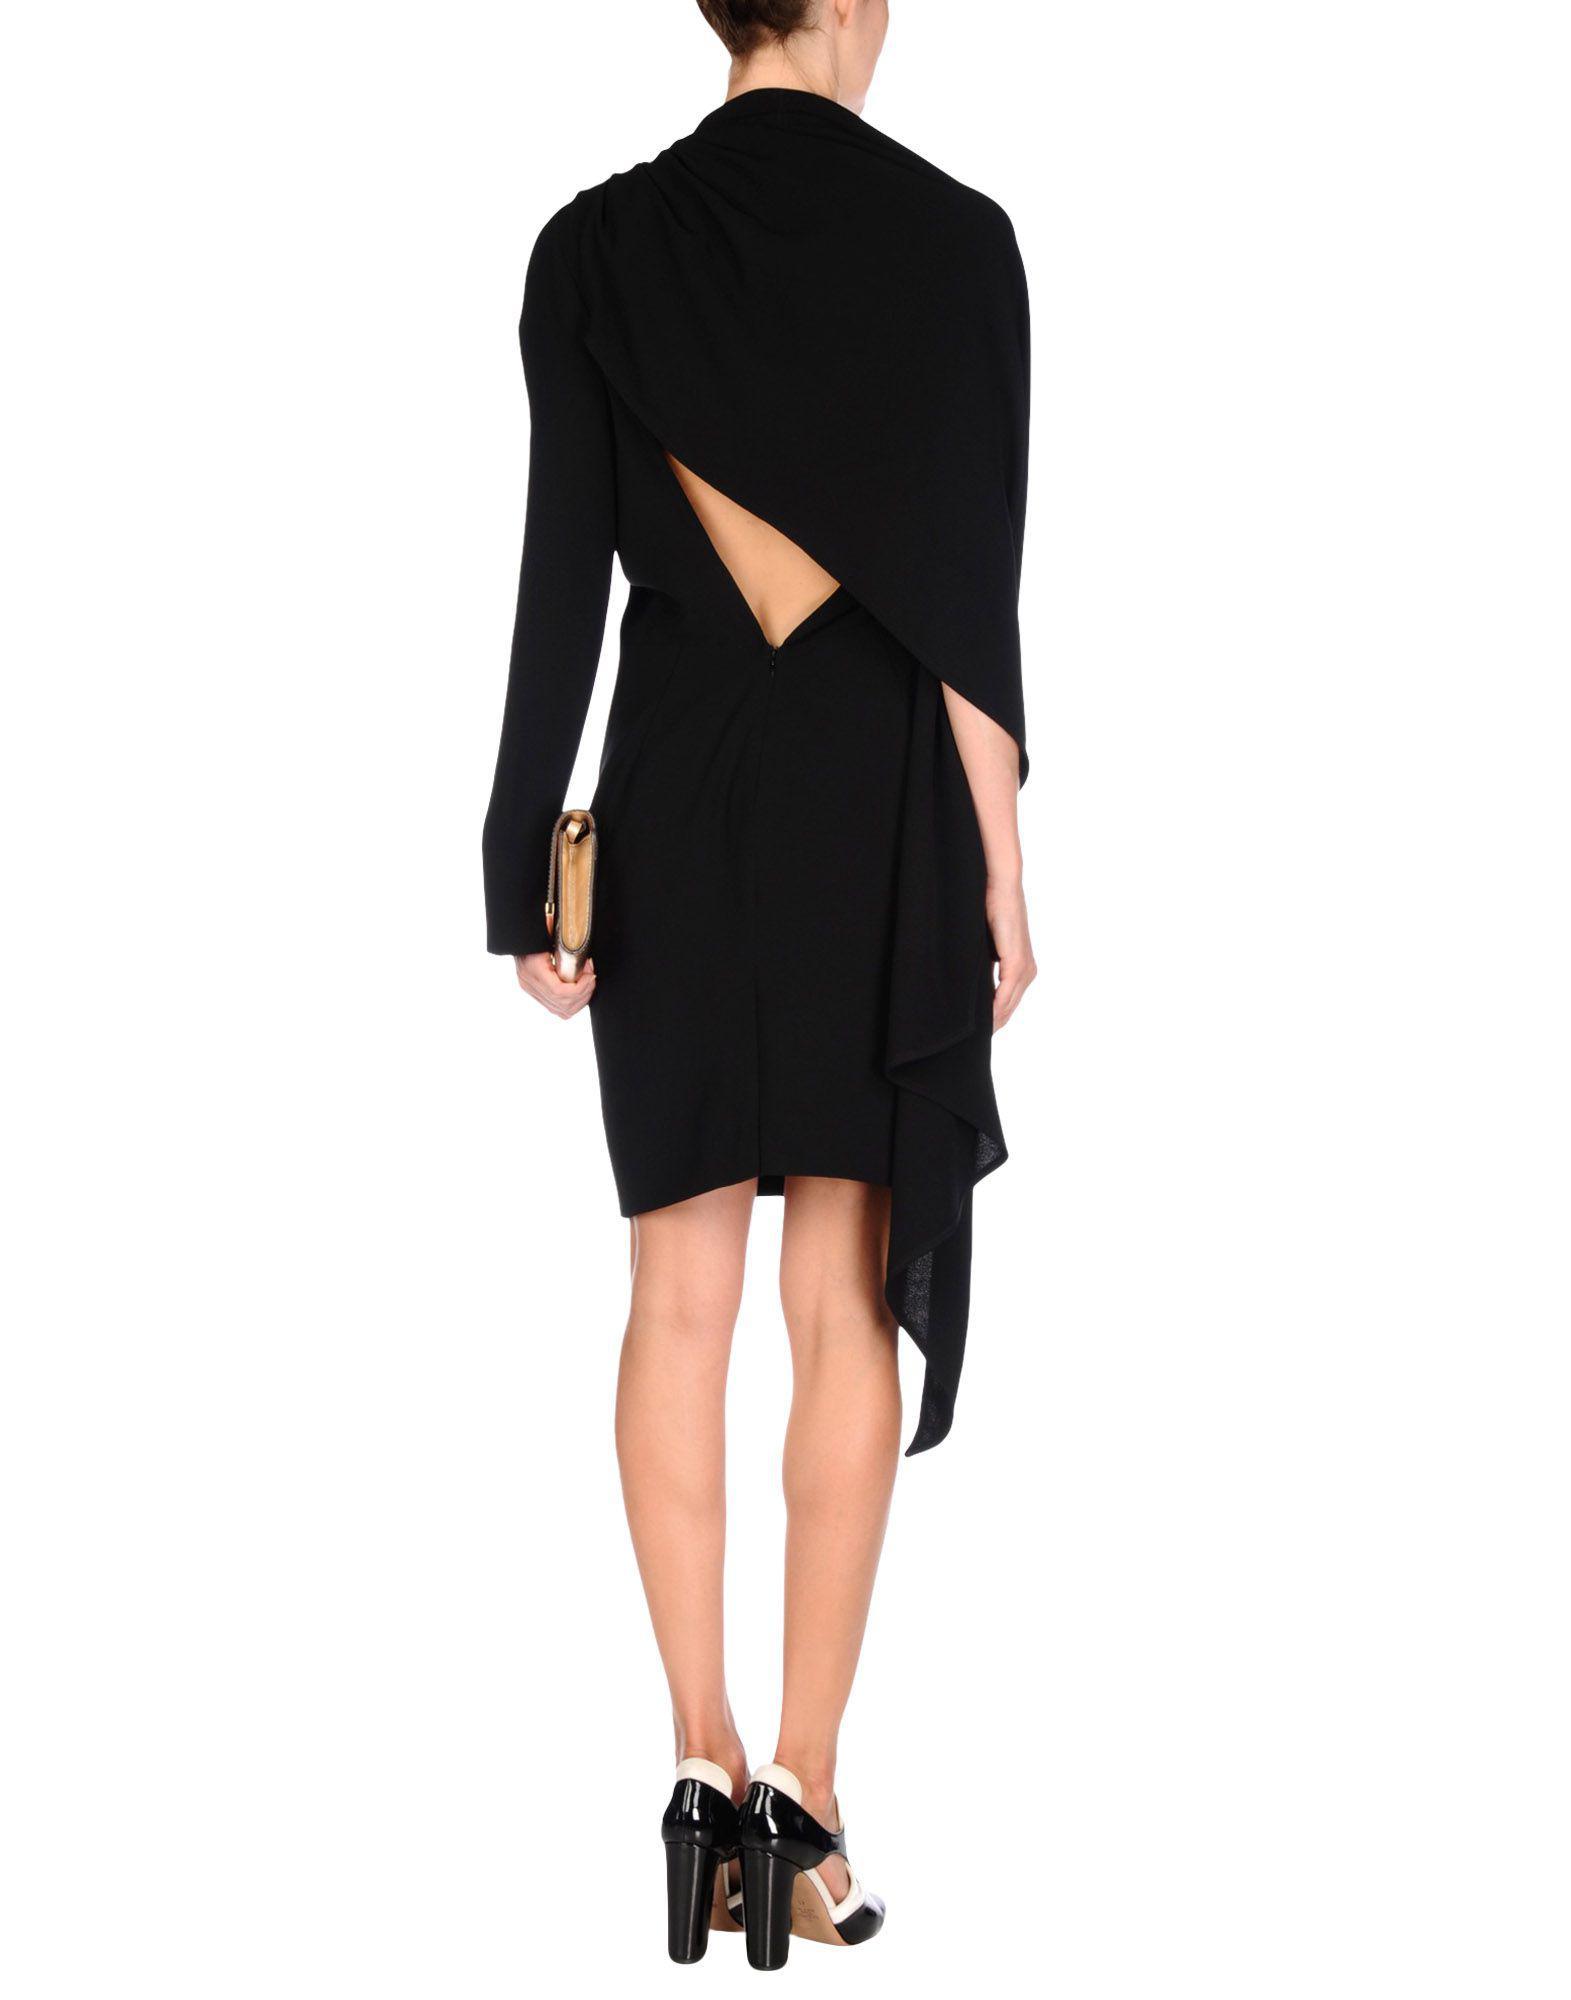 Robes - Robes Longues Du Genou Pugh Gareth j1KIHQ1k